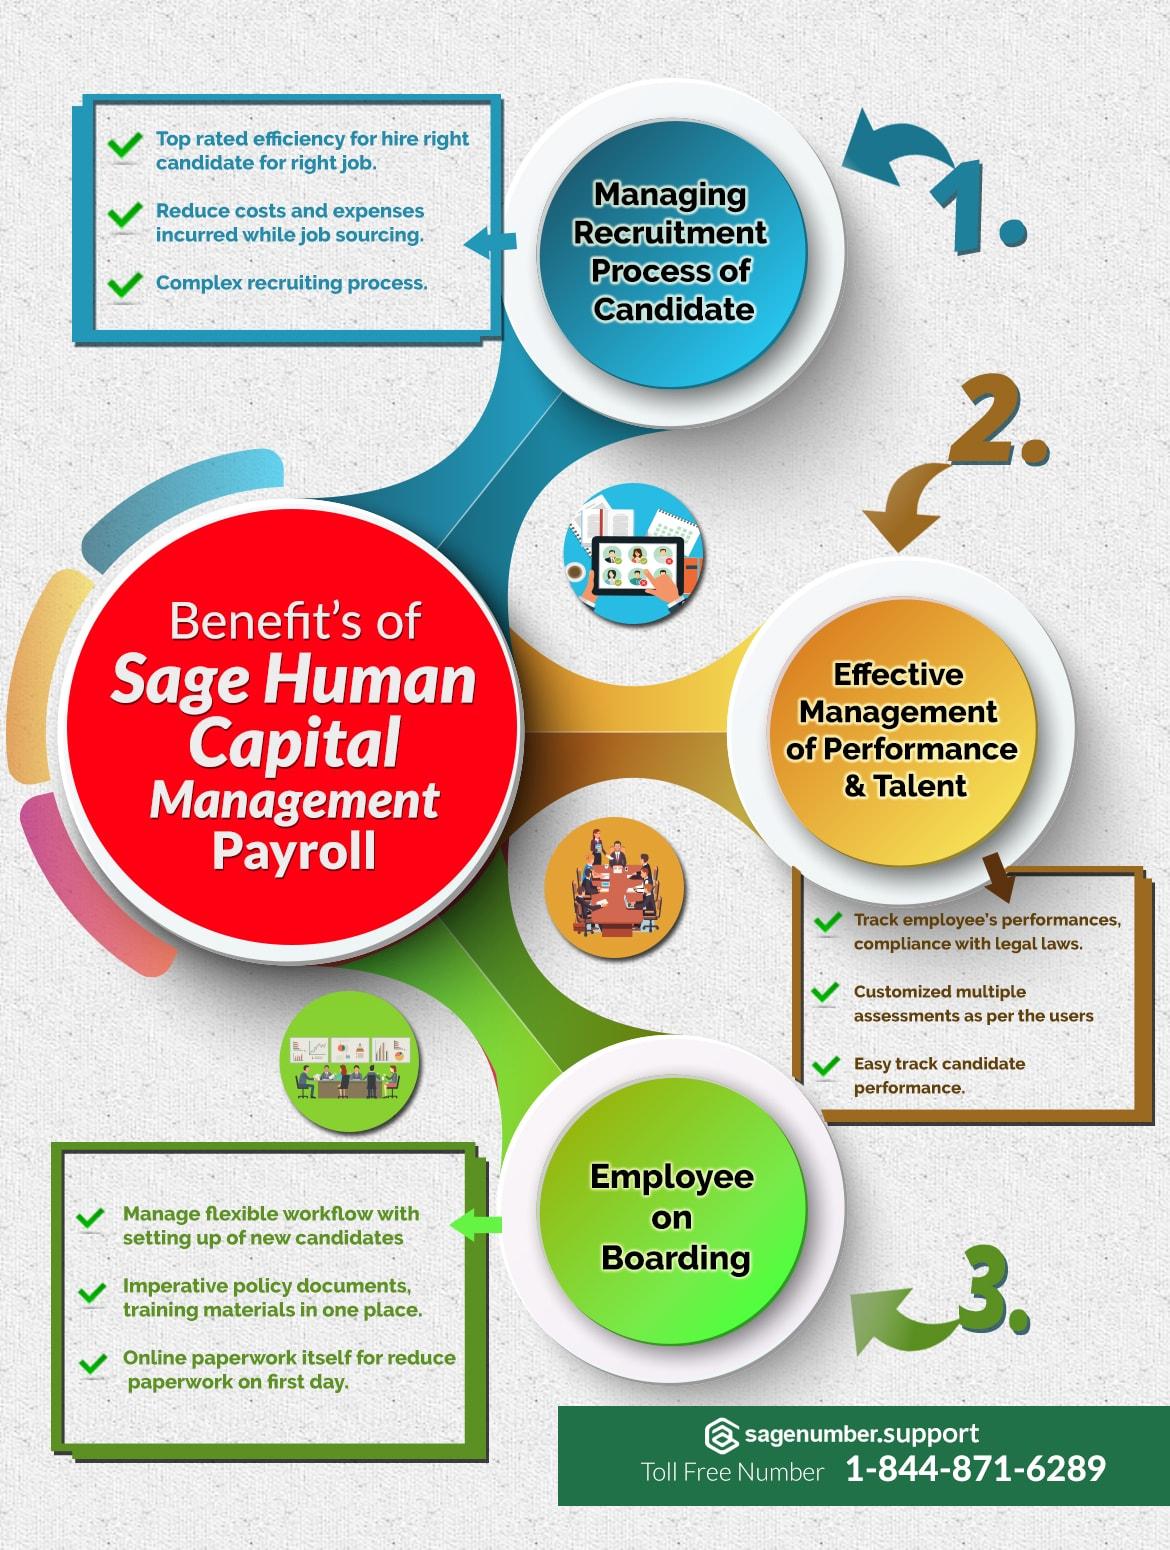 sage-human-capital-management-payroll-infographic